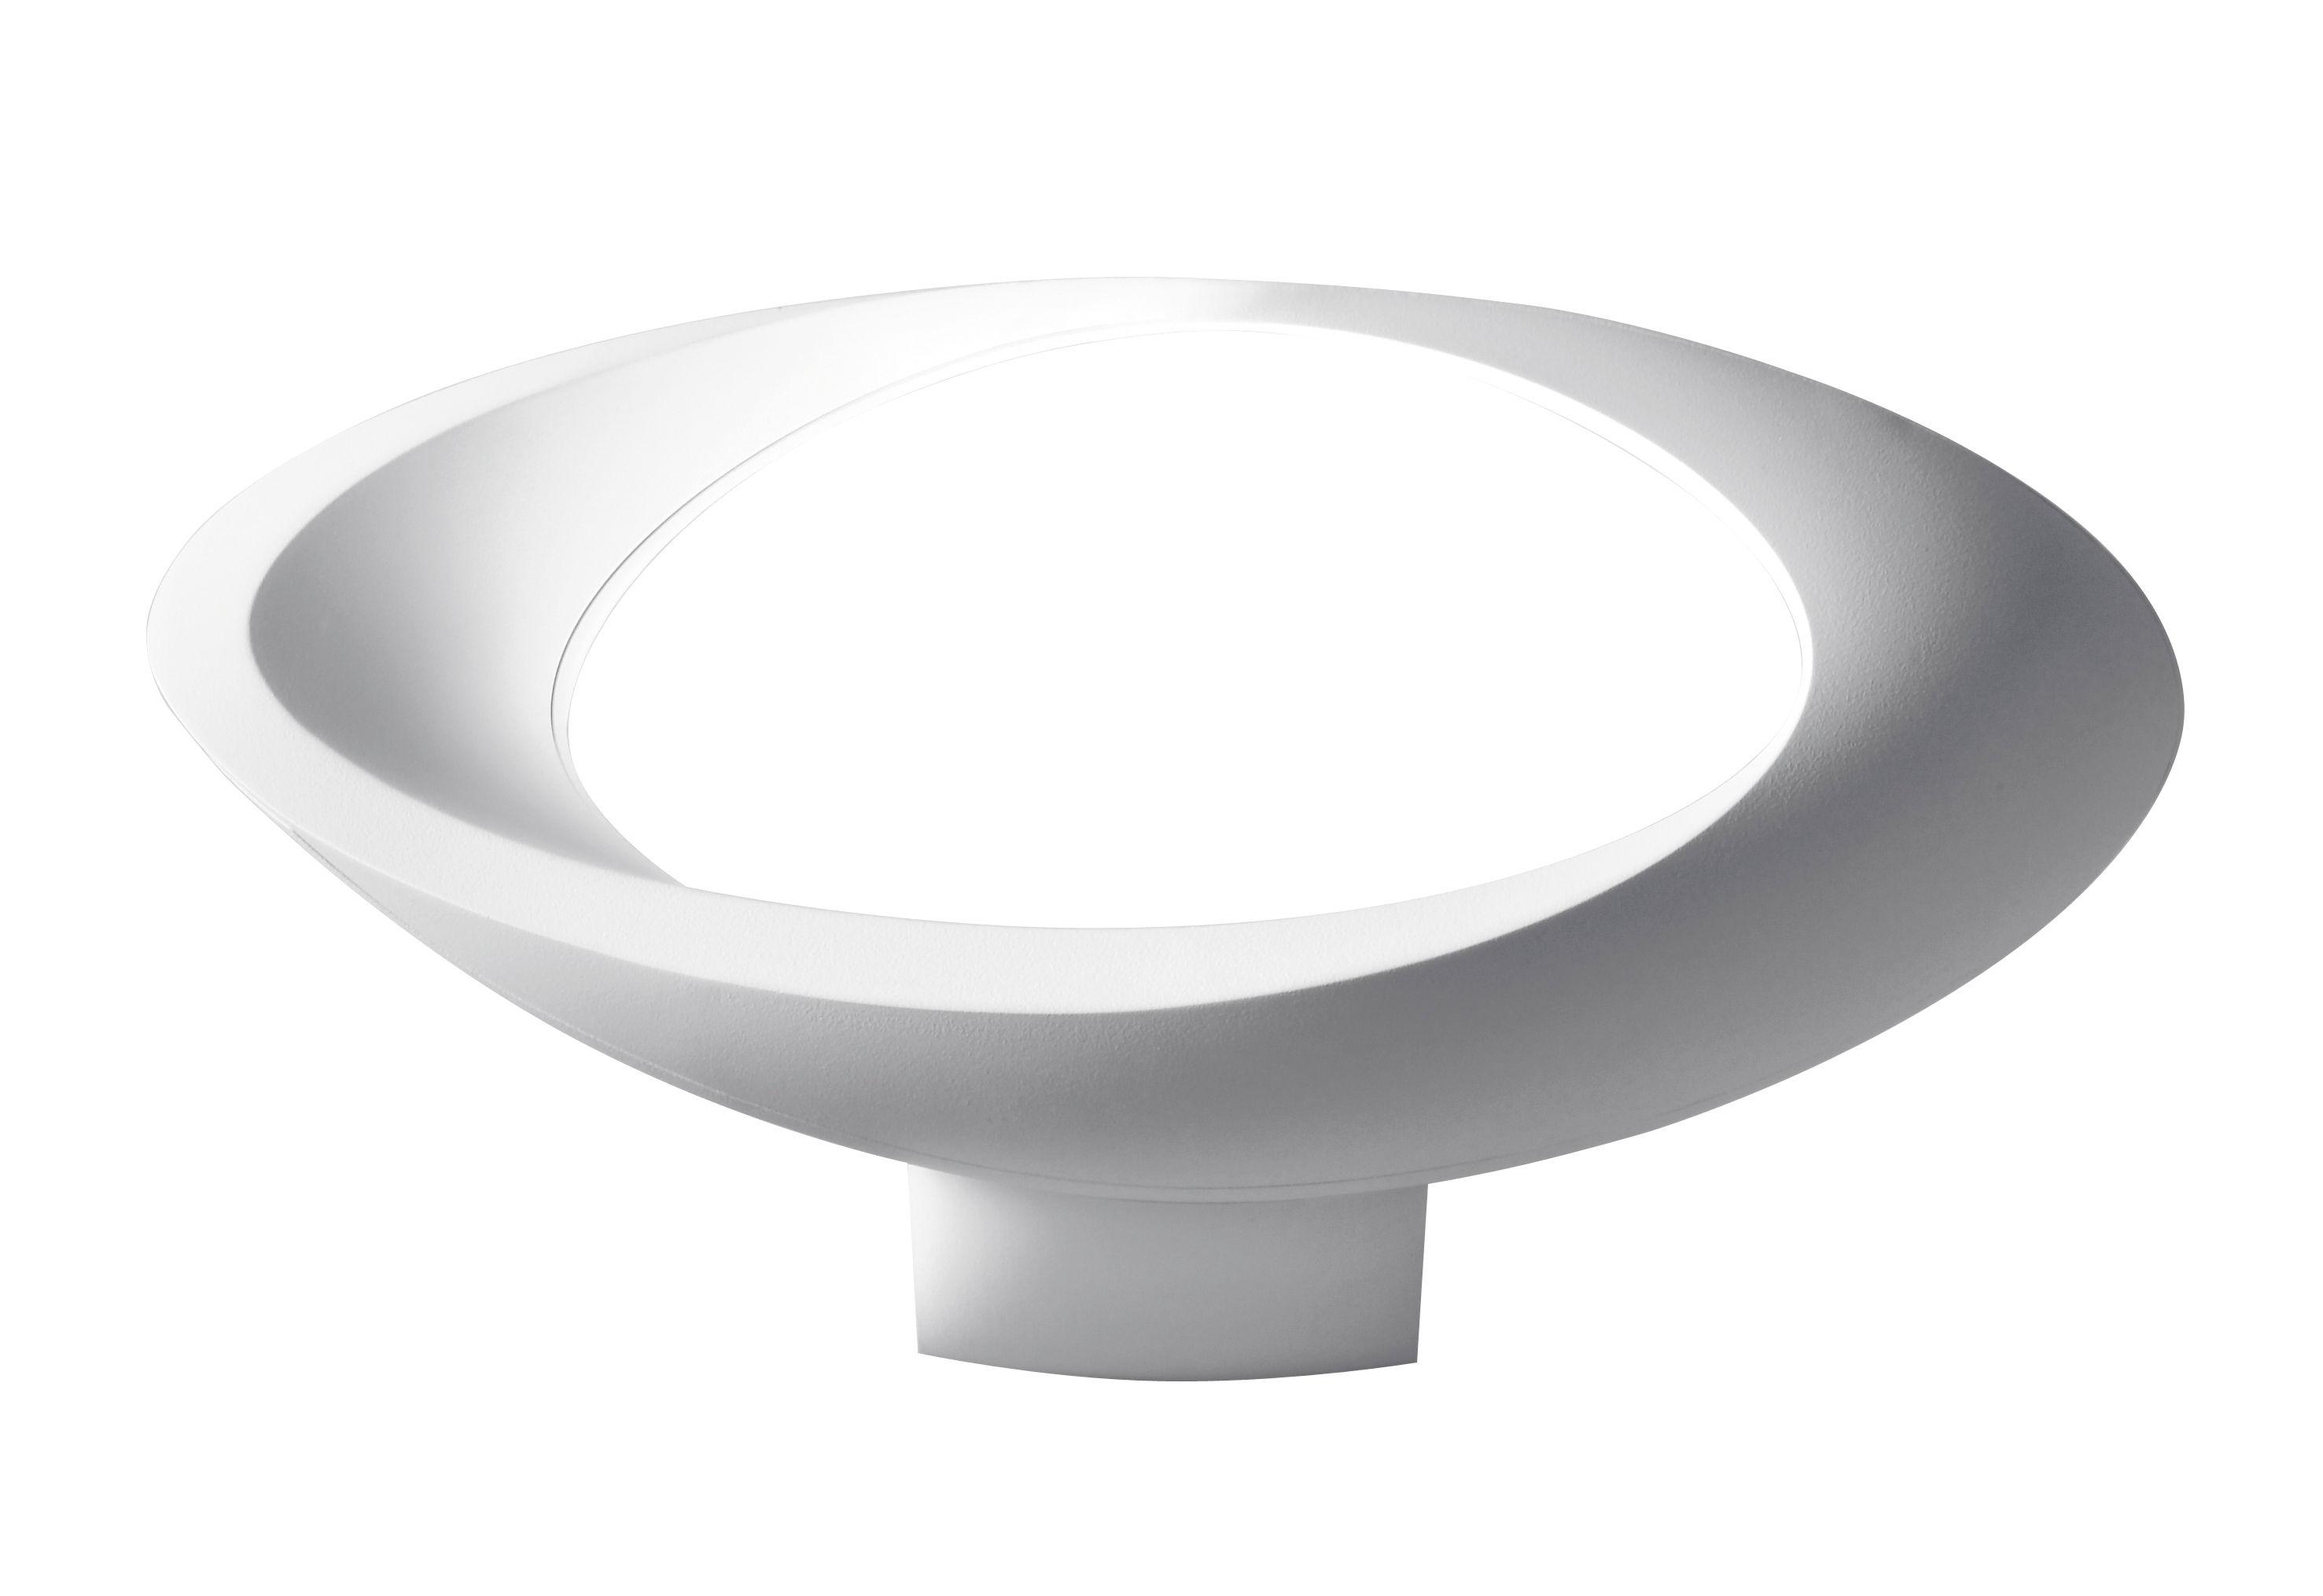 Leuchten - Wandleuchten - Cabildo LED Wandleuchte - Artemide - Weiß - bemaltes Aluminium